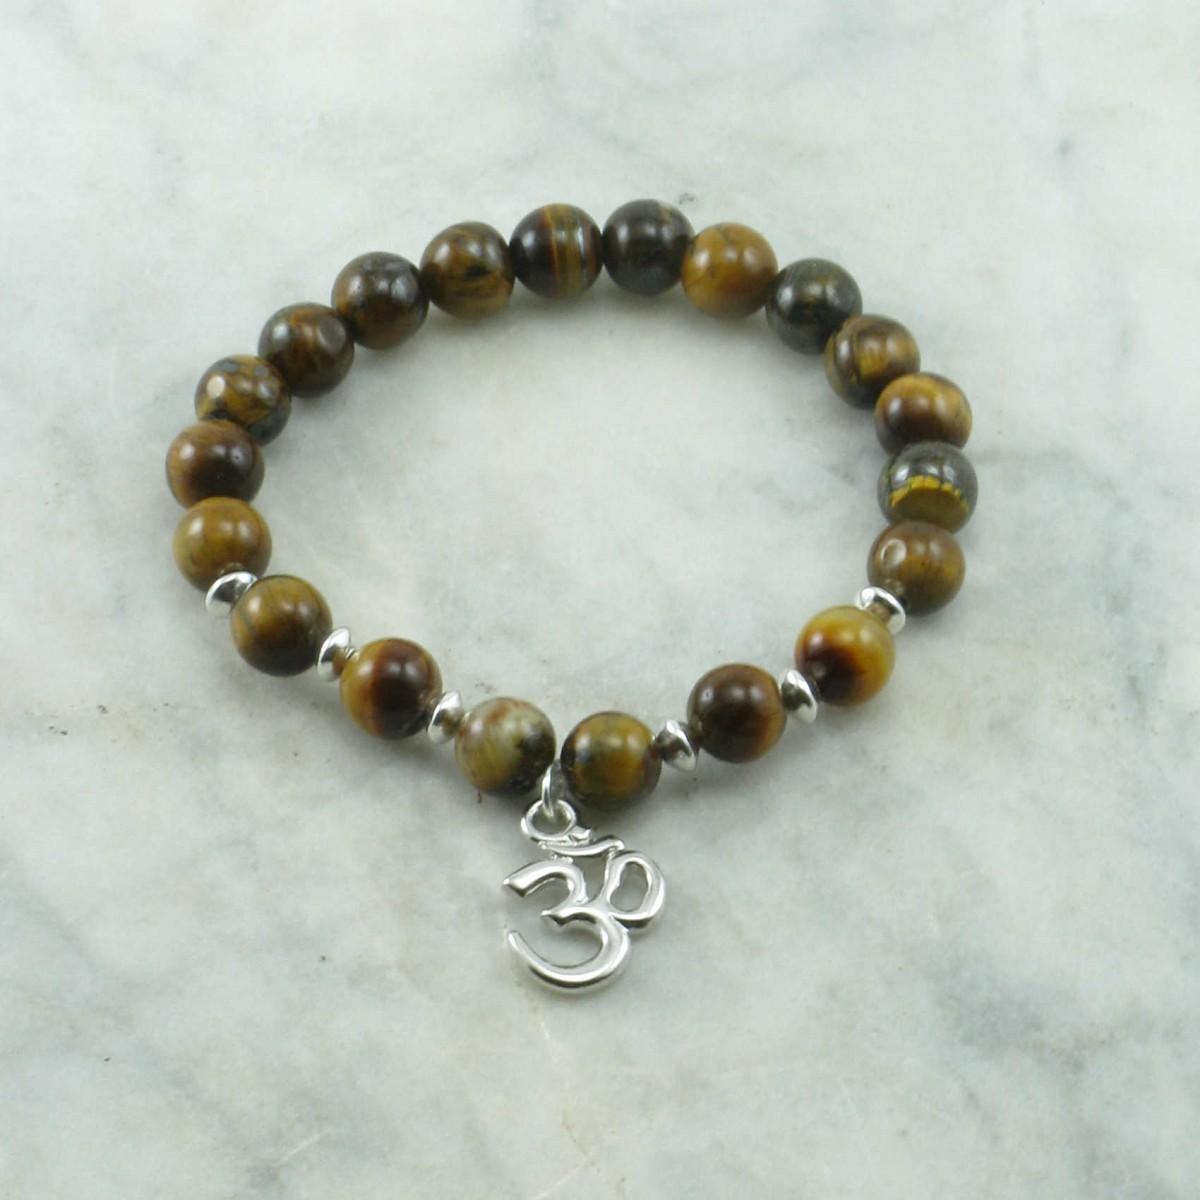 Balance_Mala_Beads_Tiger_Eye_Mala_Bracelet